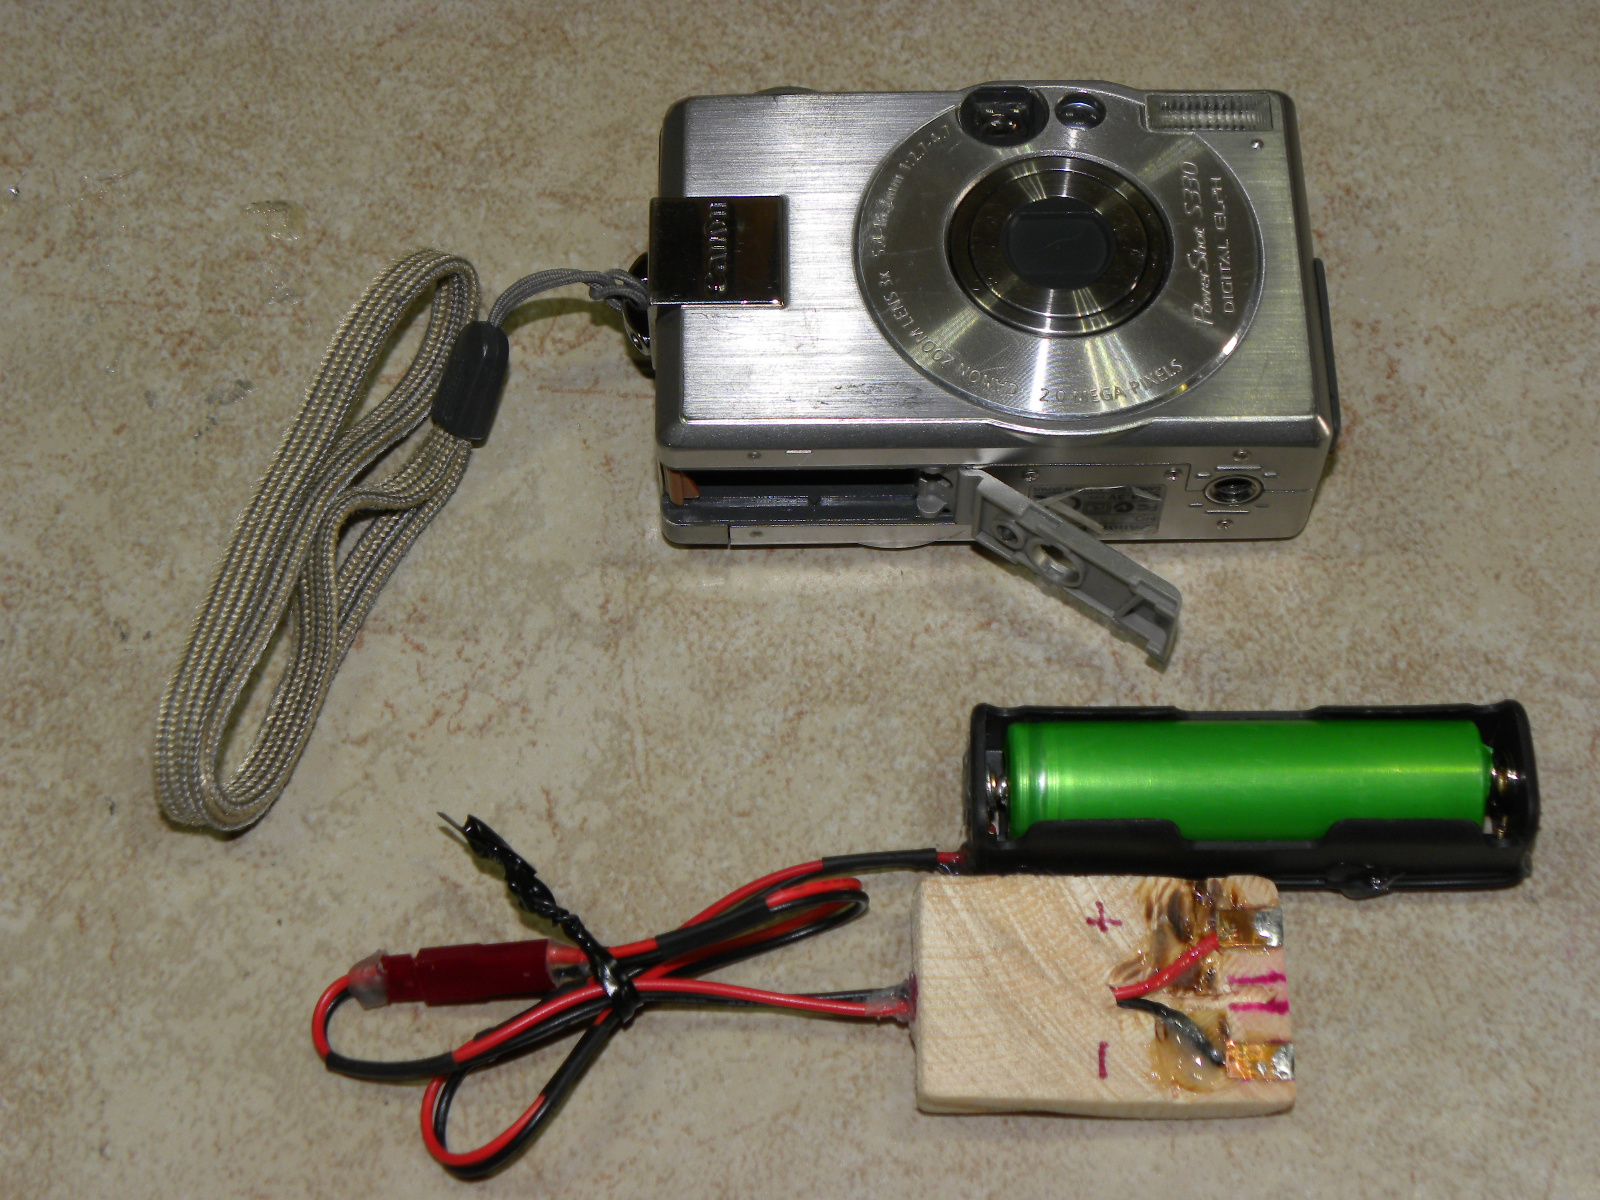 External Li-ion Battery for Digital Cameras